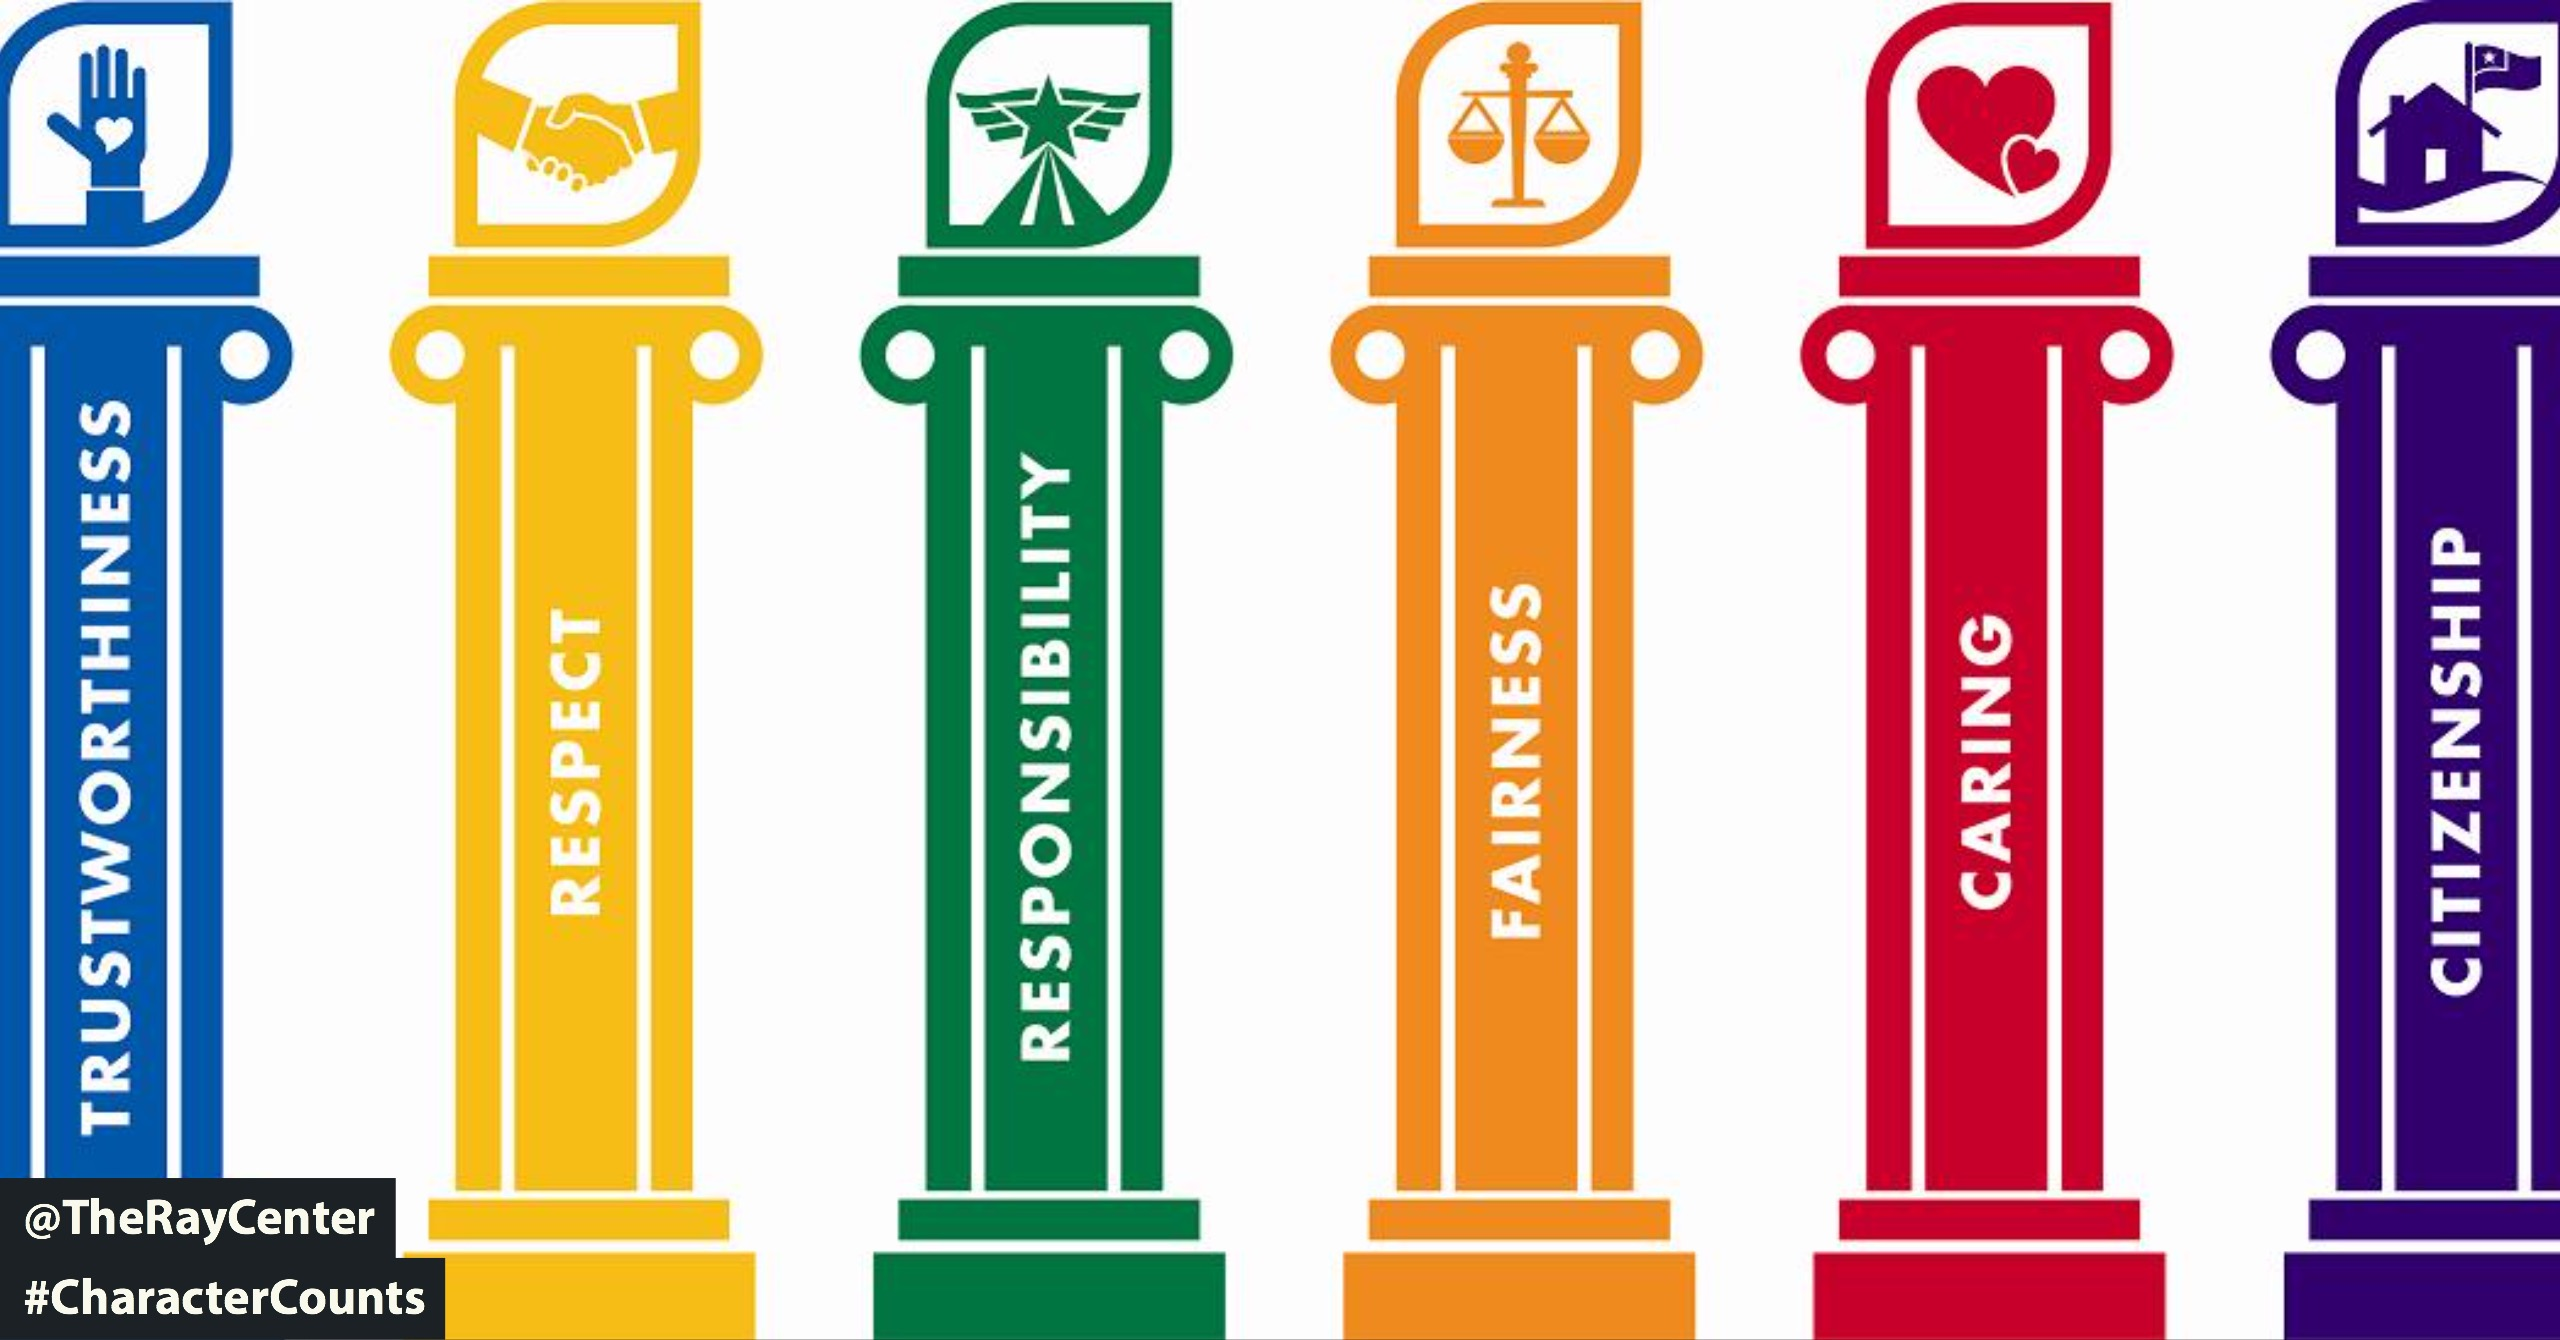 How The Six Pillars Help Us Do Our Best Work The Robert